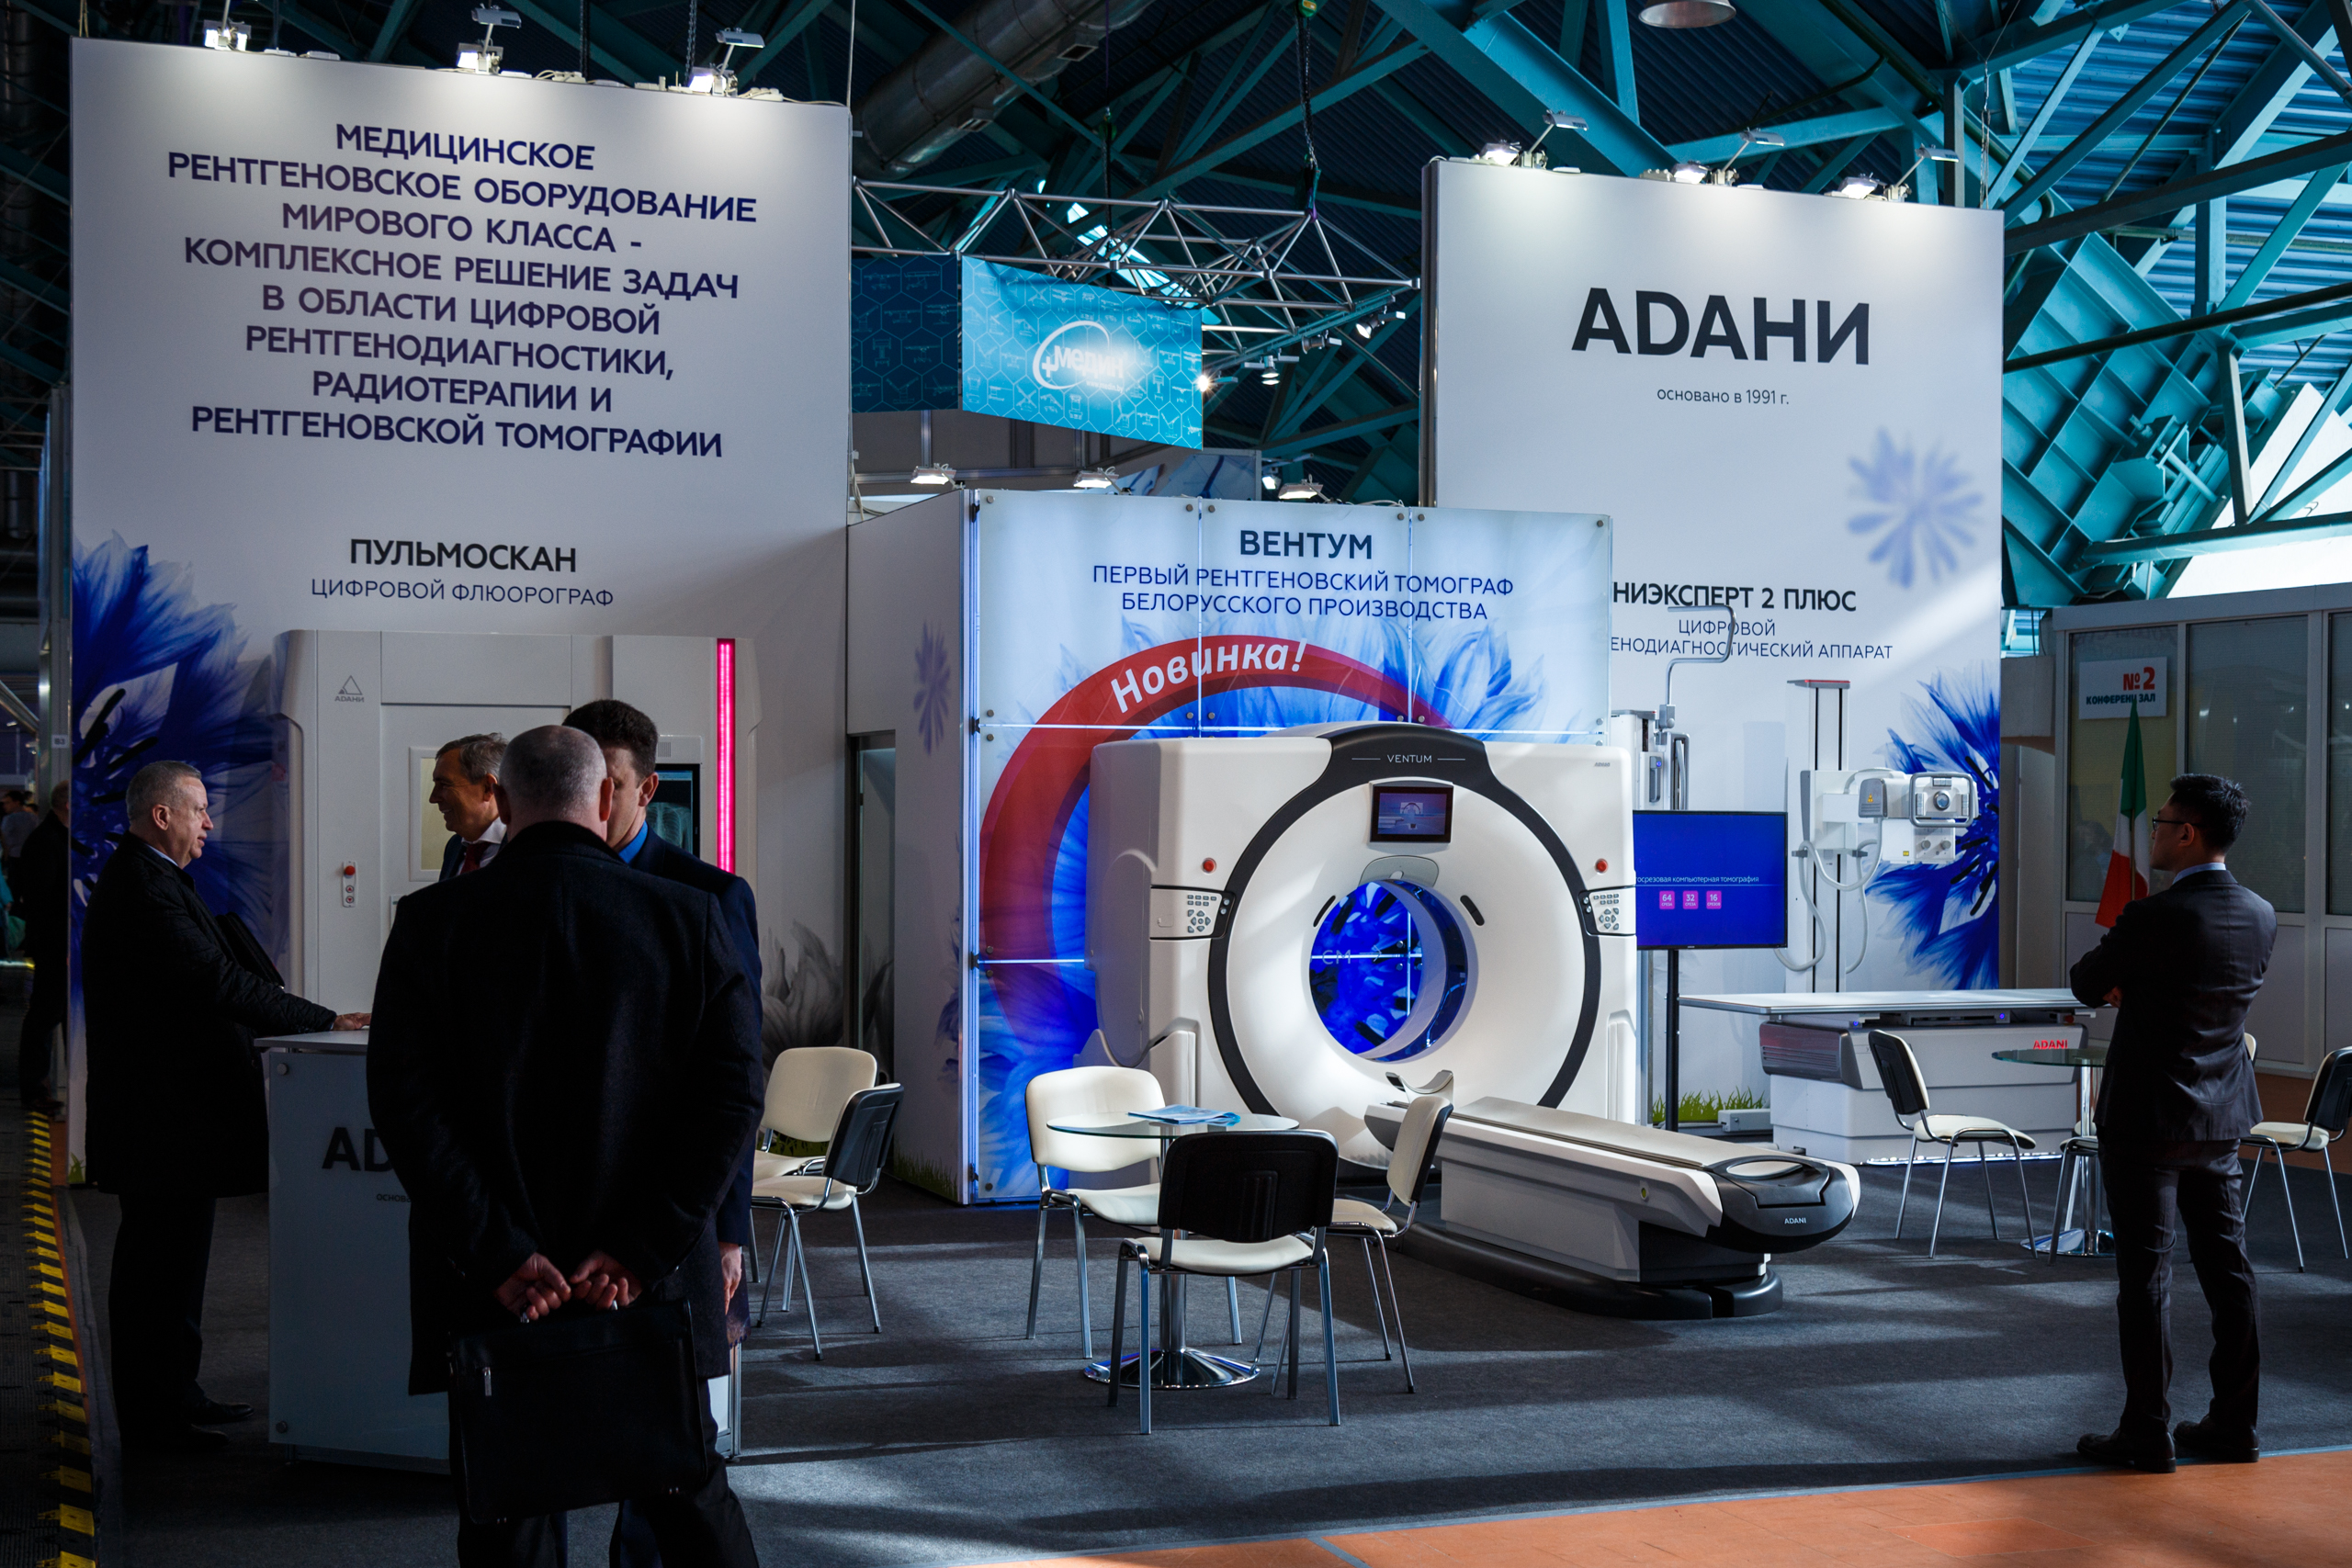 выставка здравоохранение беларуси 2018